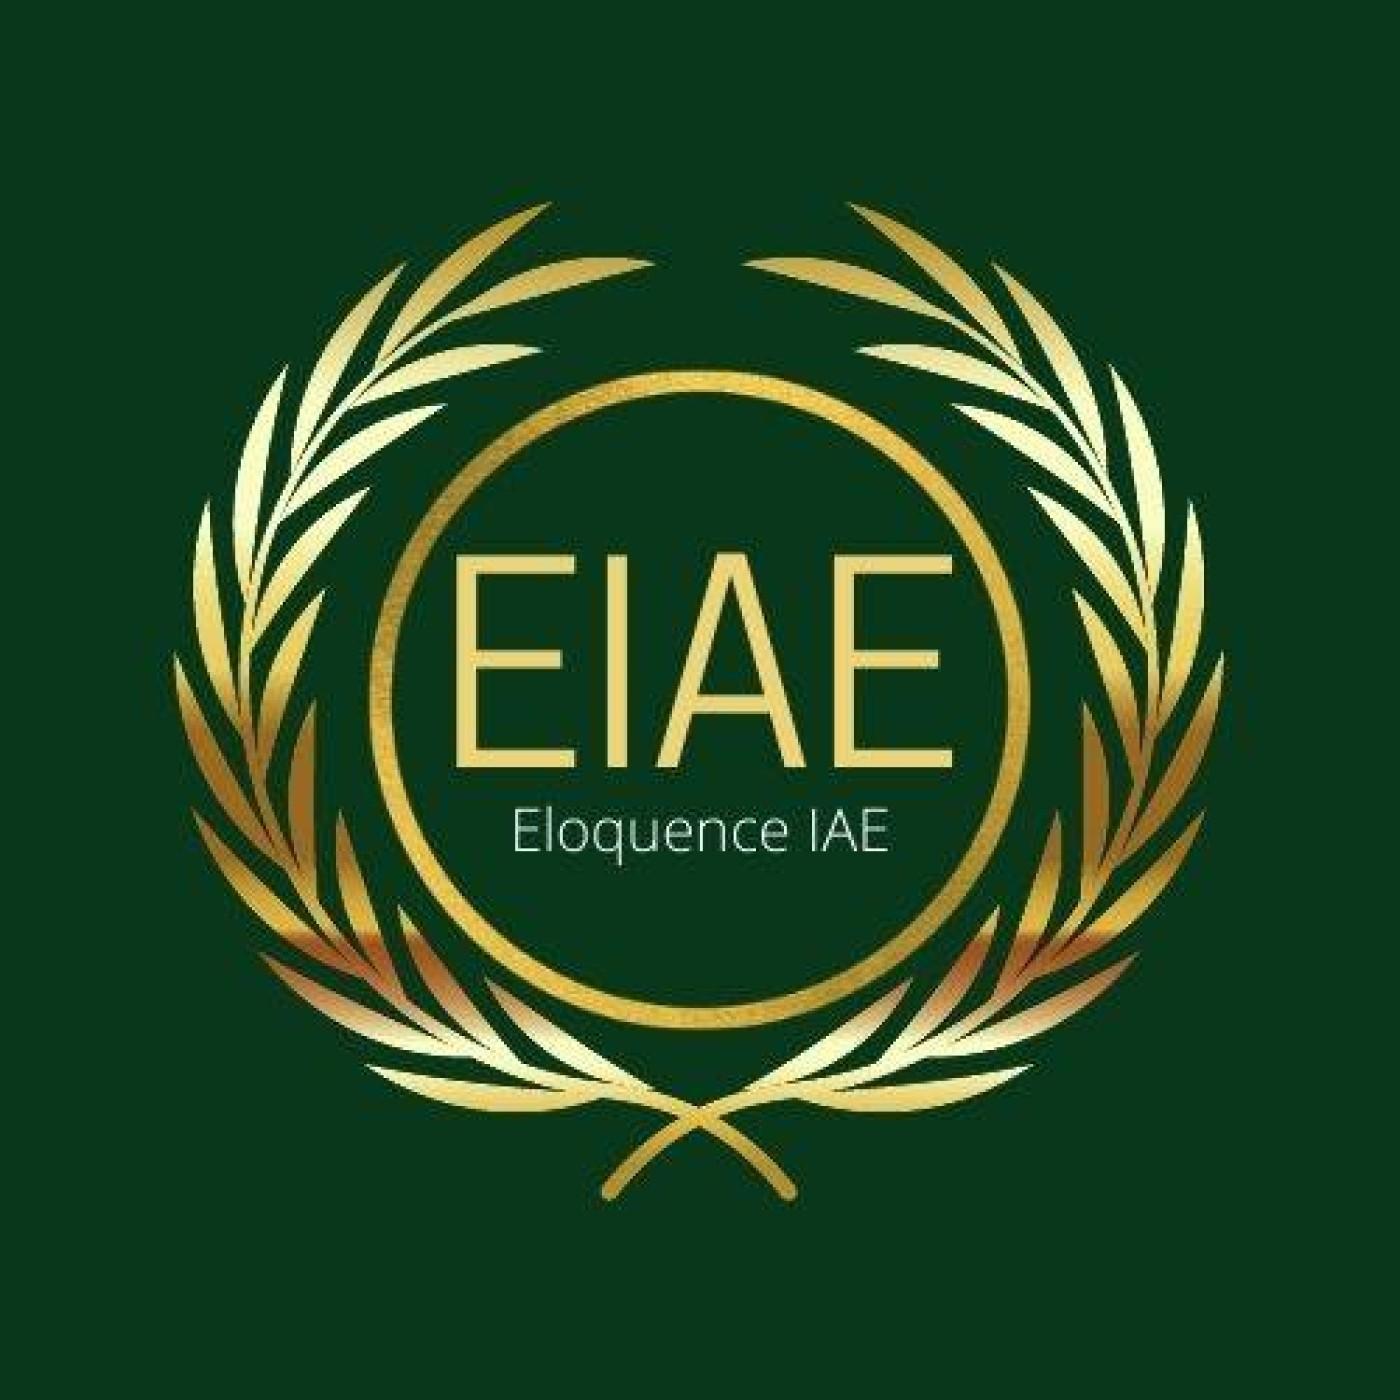 Maxime présente le Concours d'Eloquence IAE Lille 2021 - 14 01 2021 - StereoChic Radio